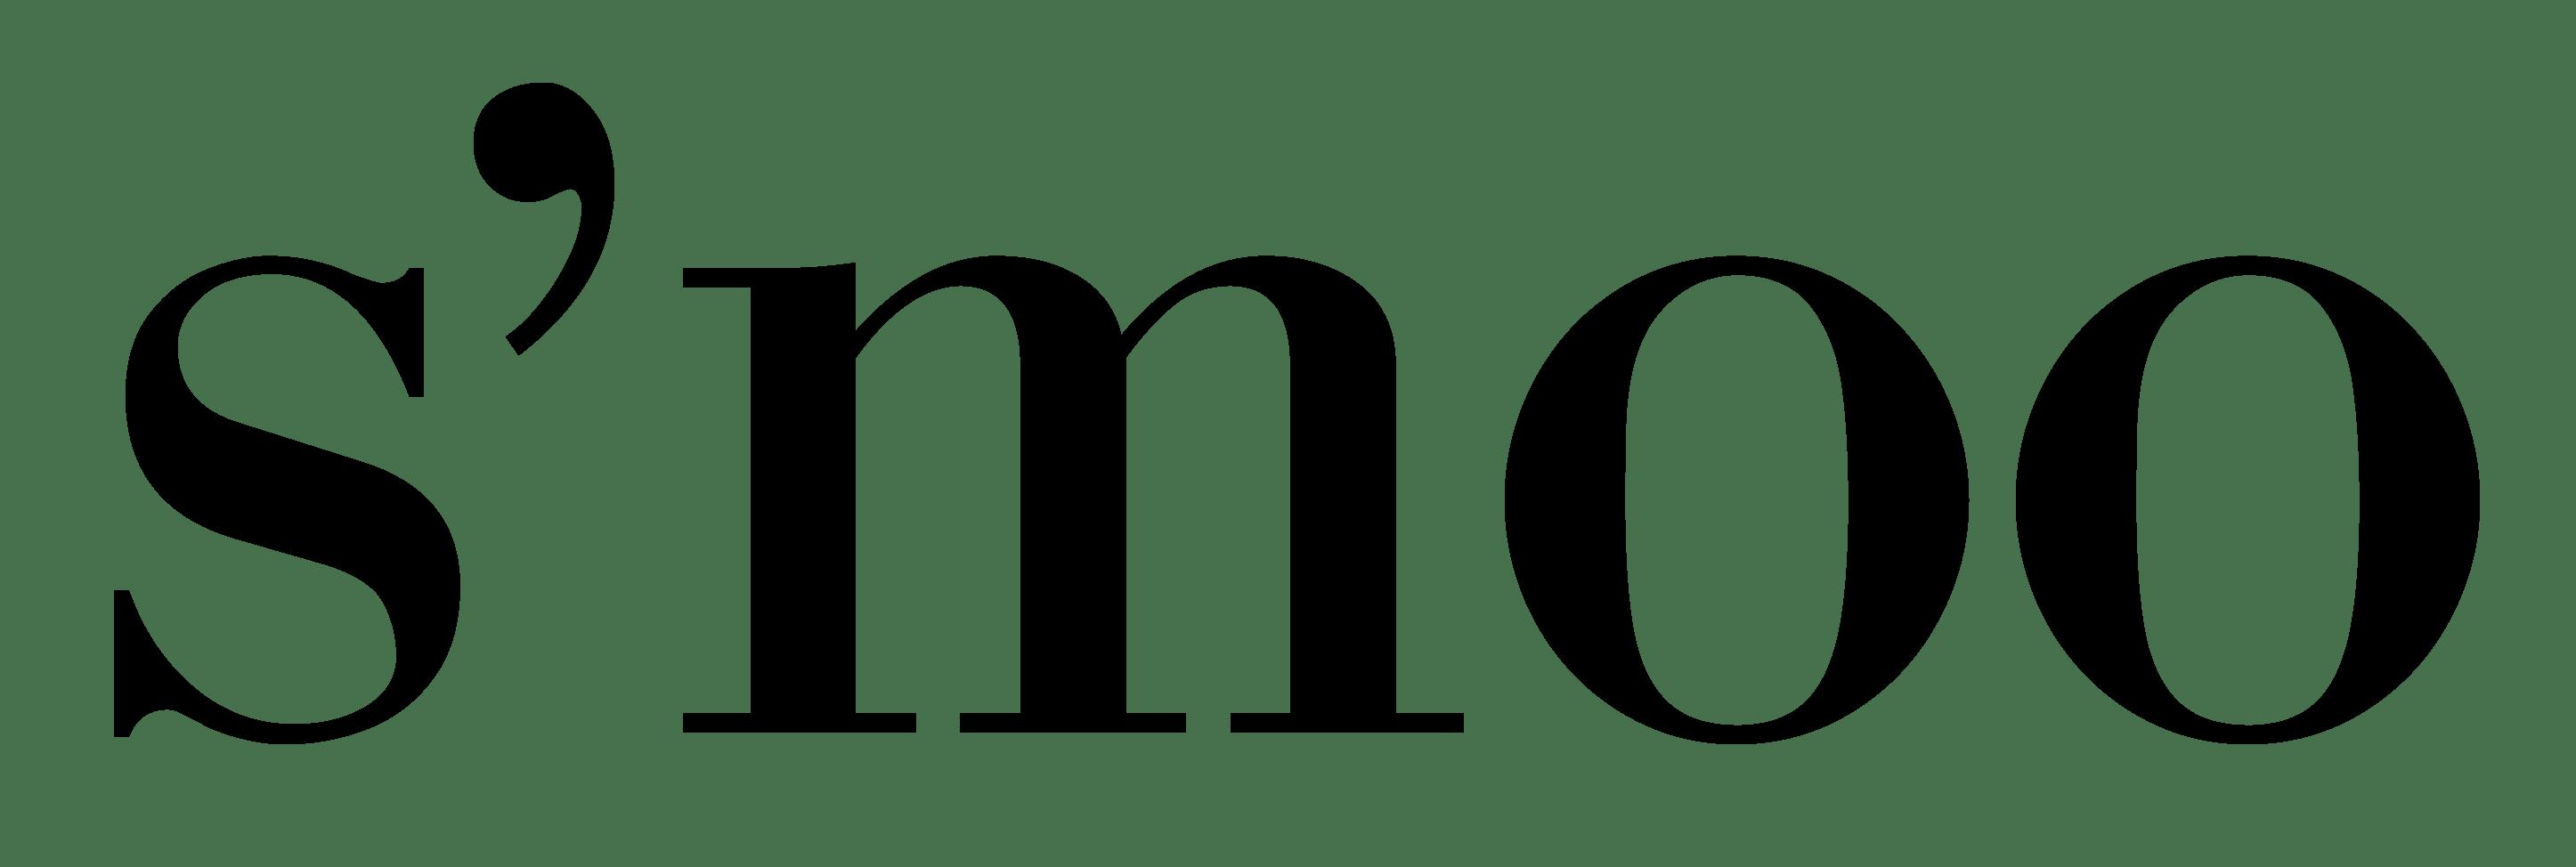 S'moo Blog